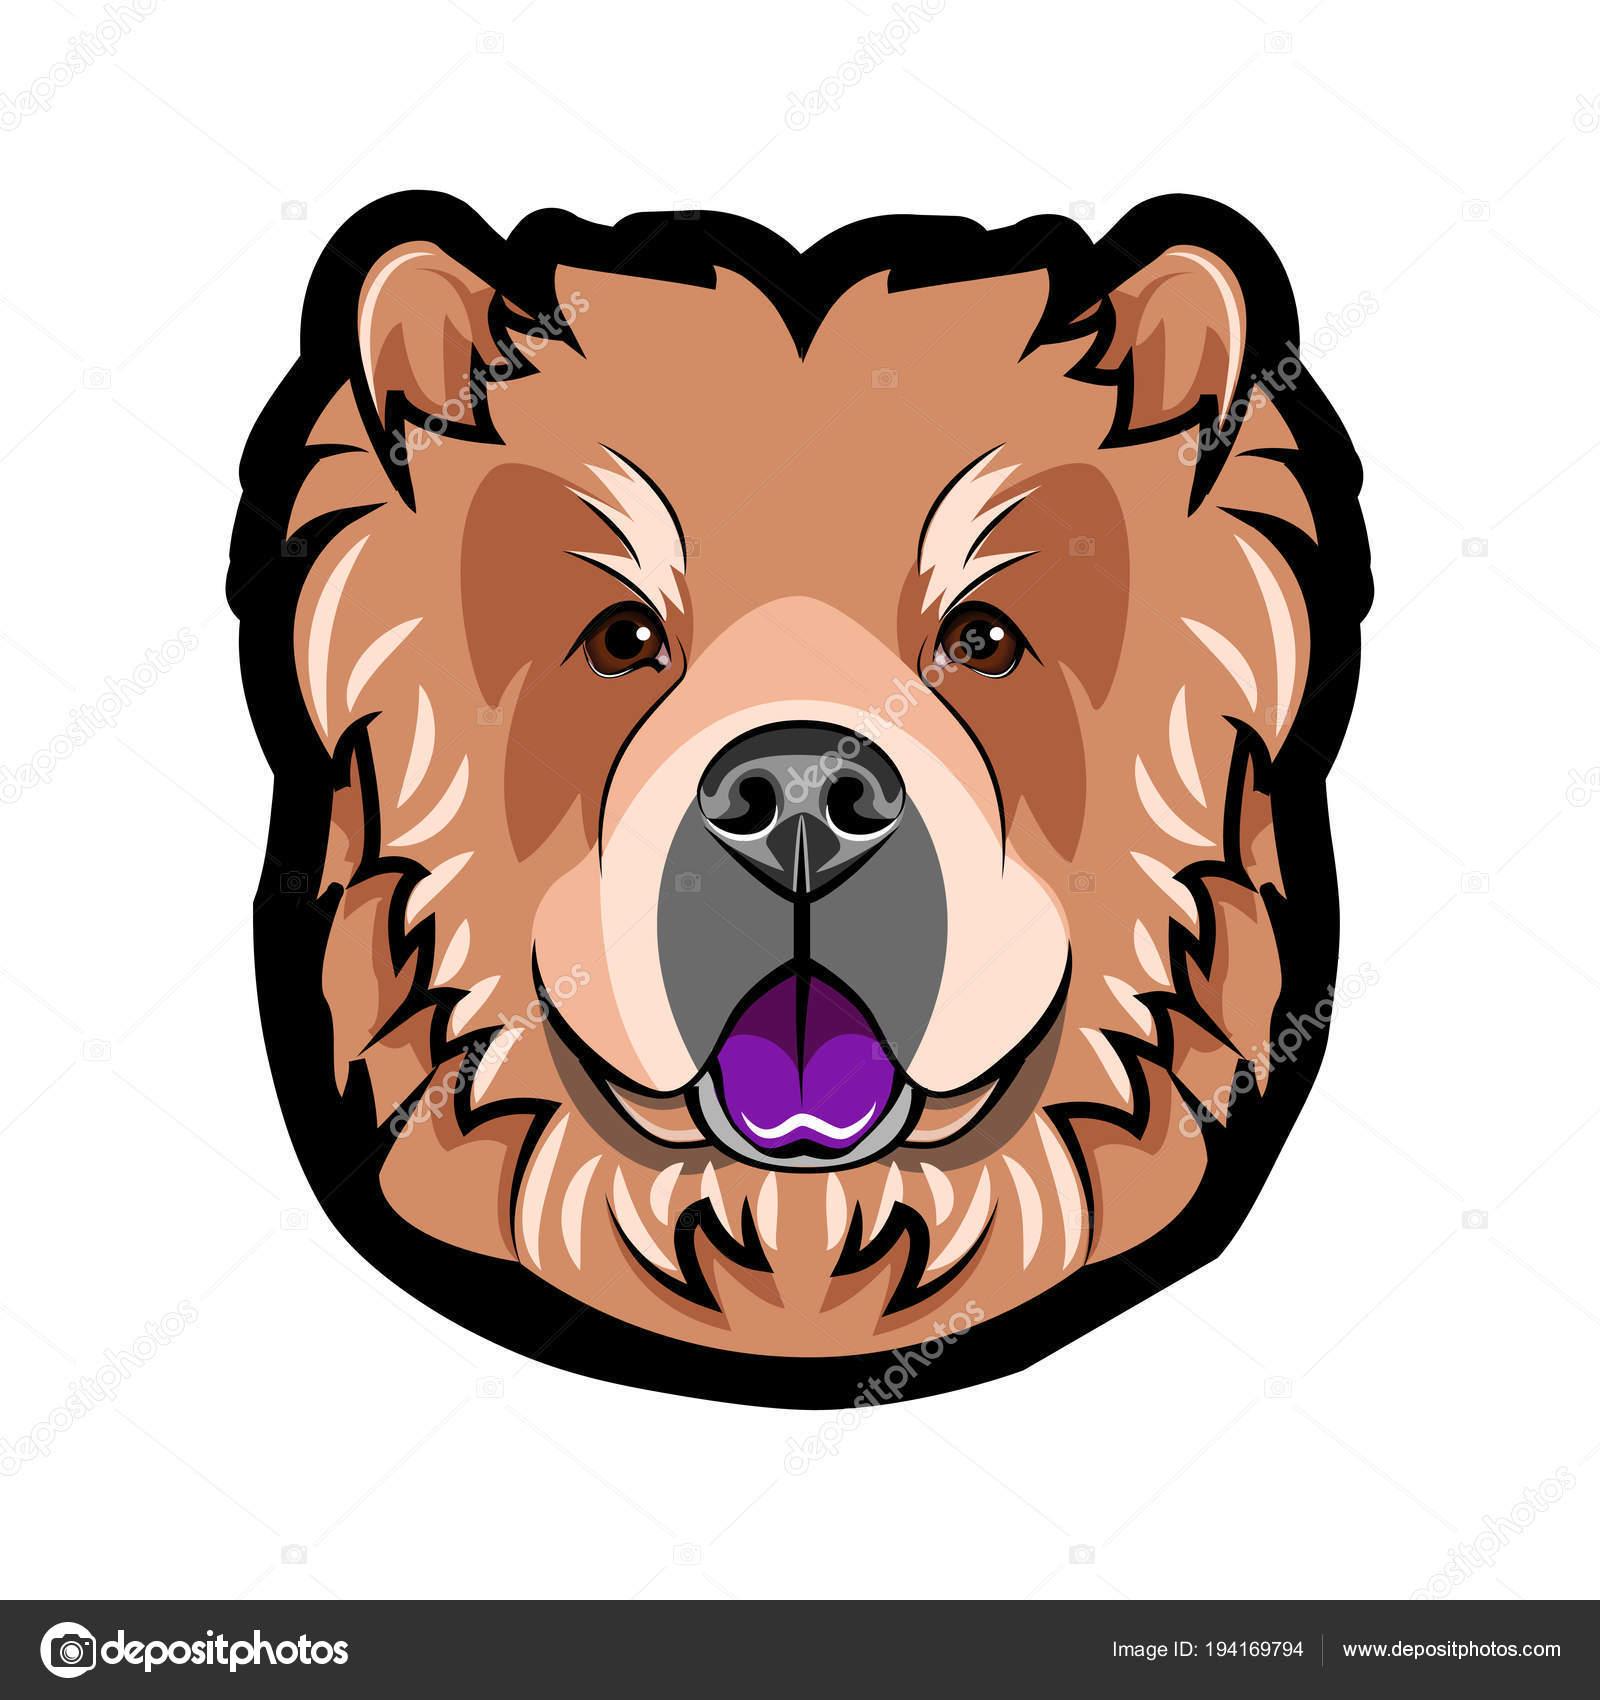 Chow Chow Dog Breed Dog Portrait Chow Chow Muzzle Face Head